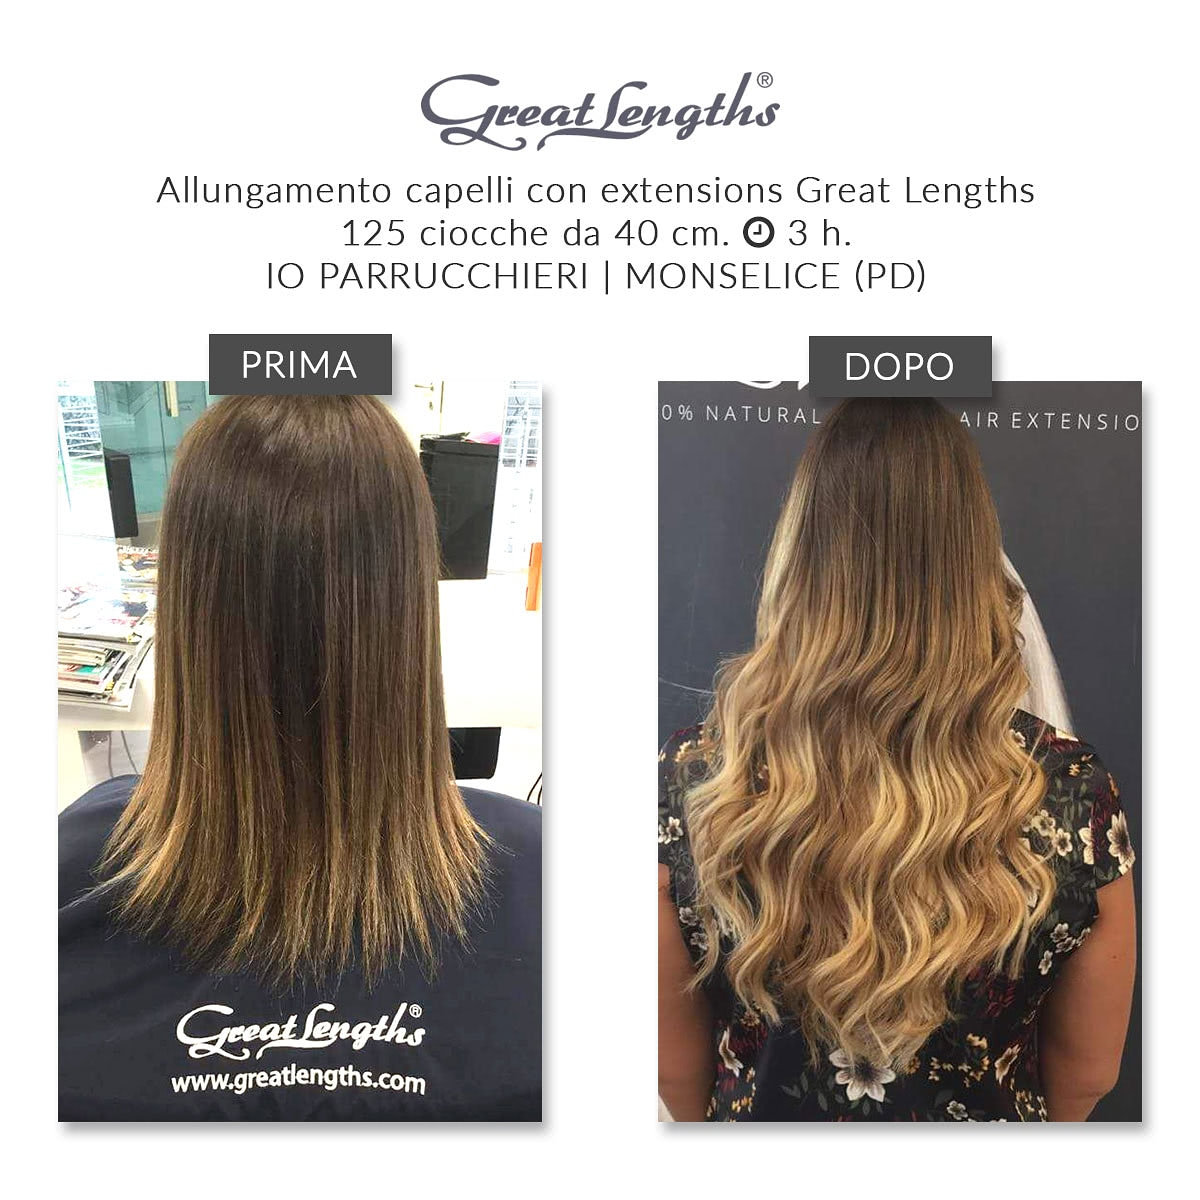 Allungamento capelli Monselice Padova con extensions Great Lenghts